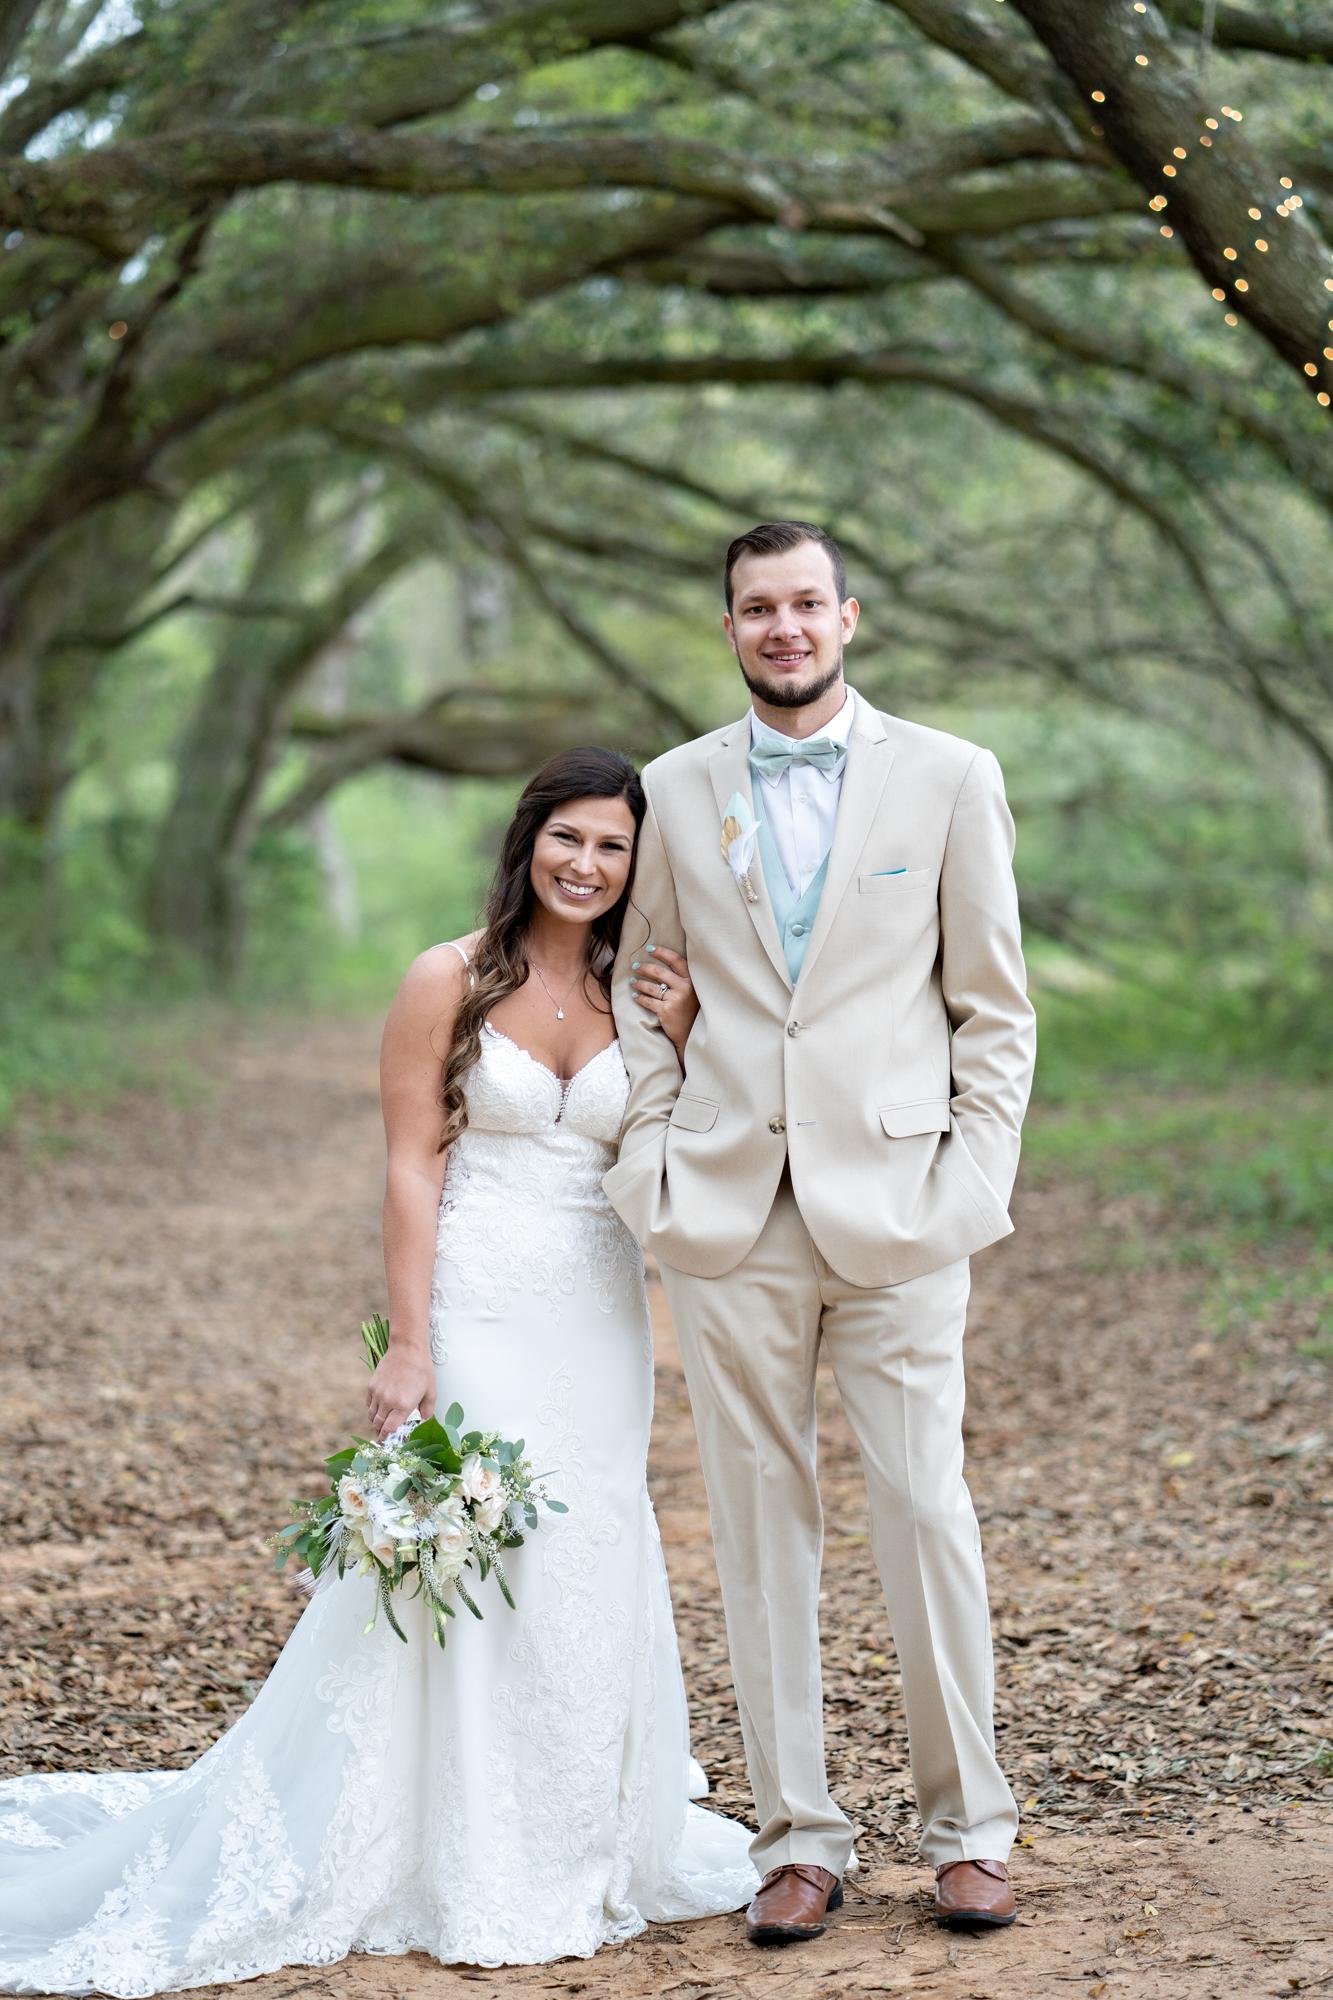 Fairhope-Alabama-Wedding-Photographers-Nick-Drollette-Photography-141.jpg